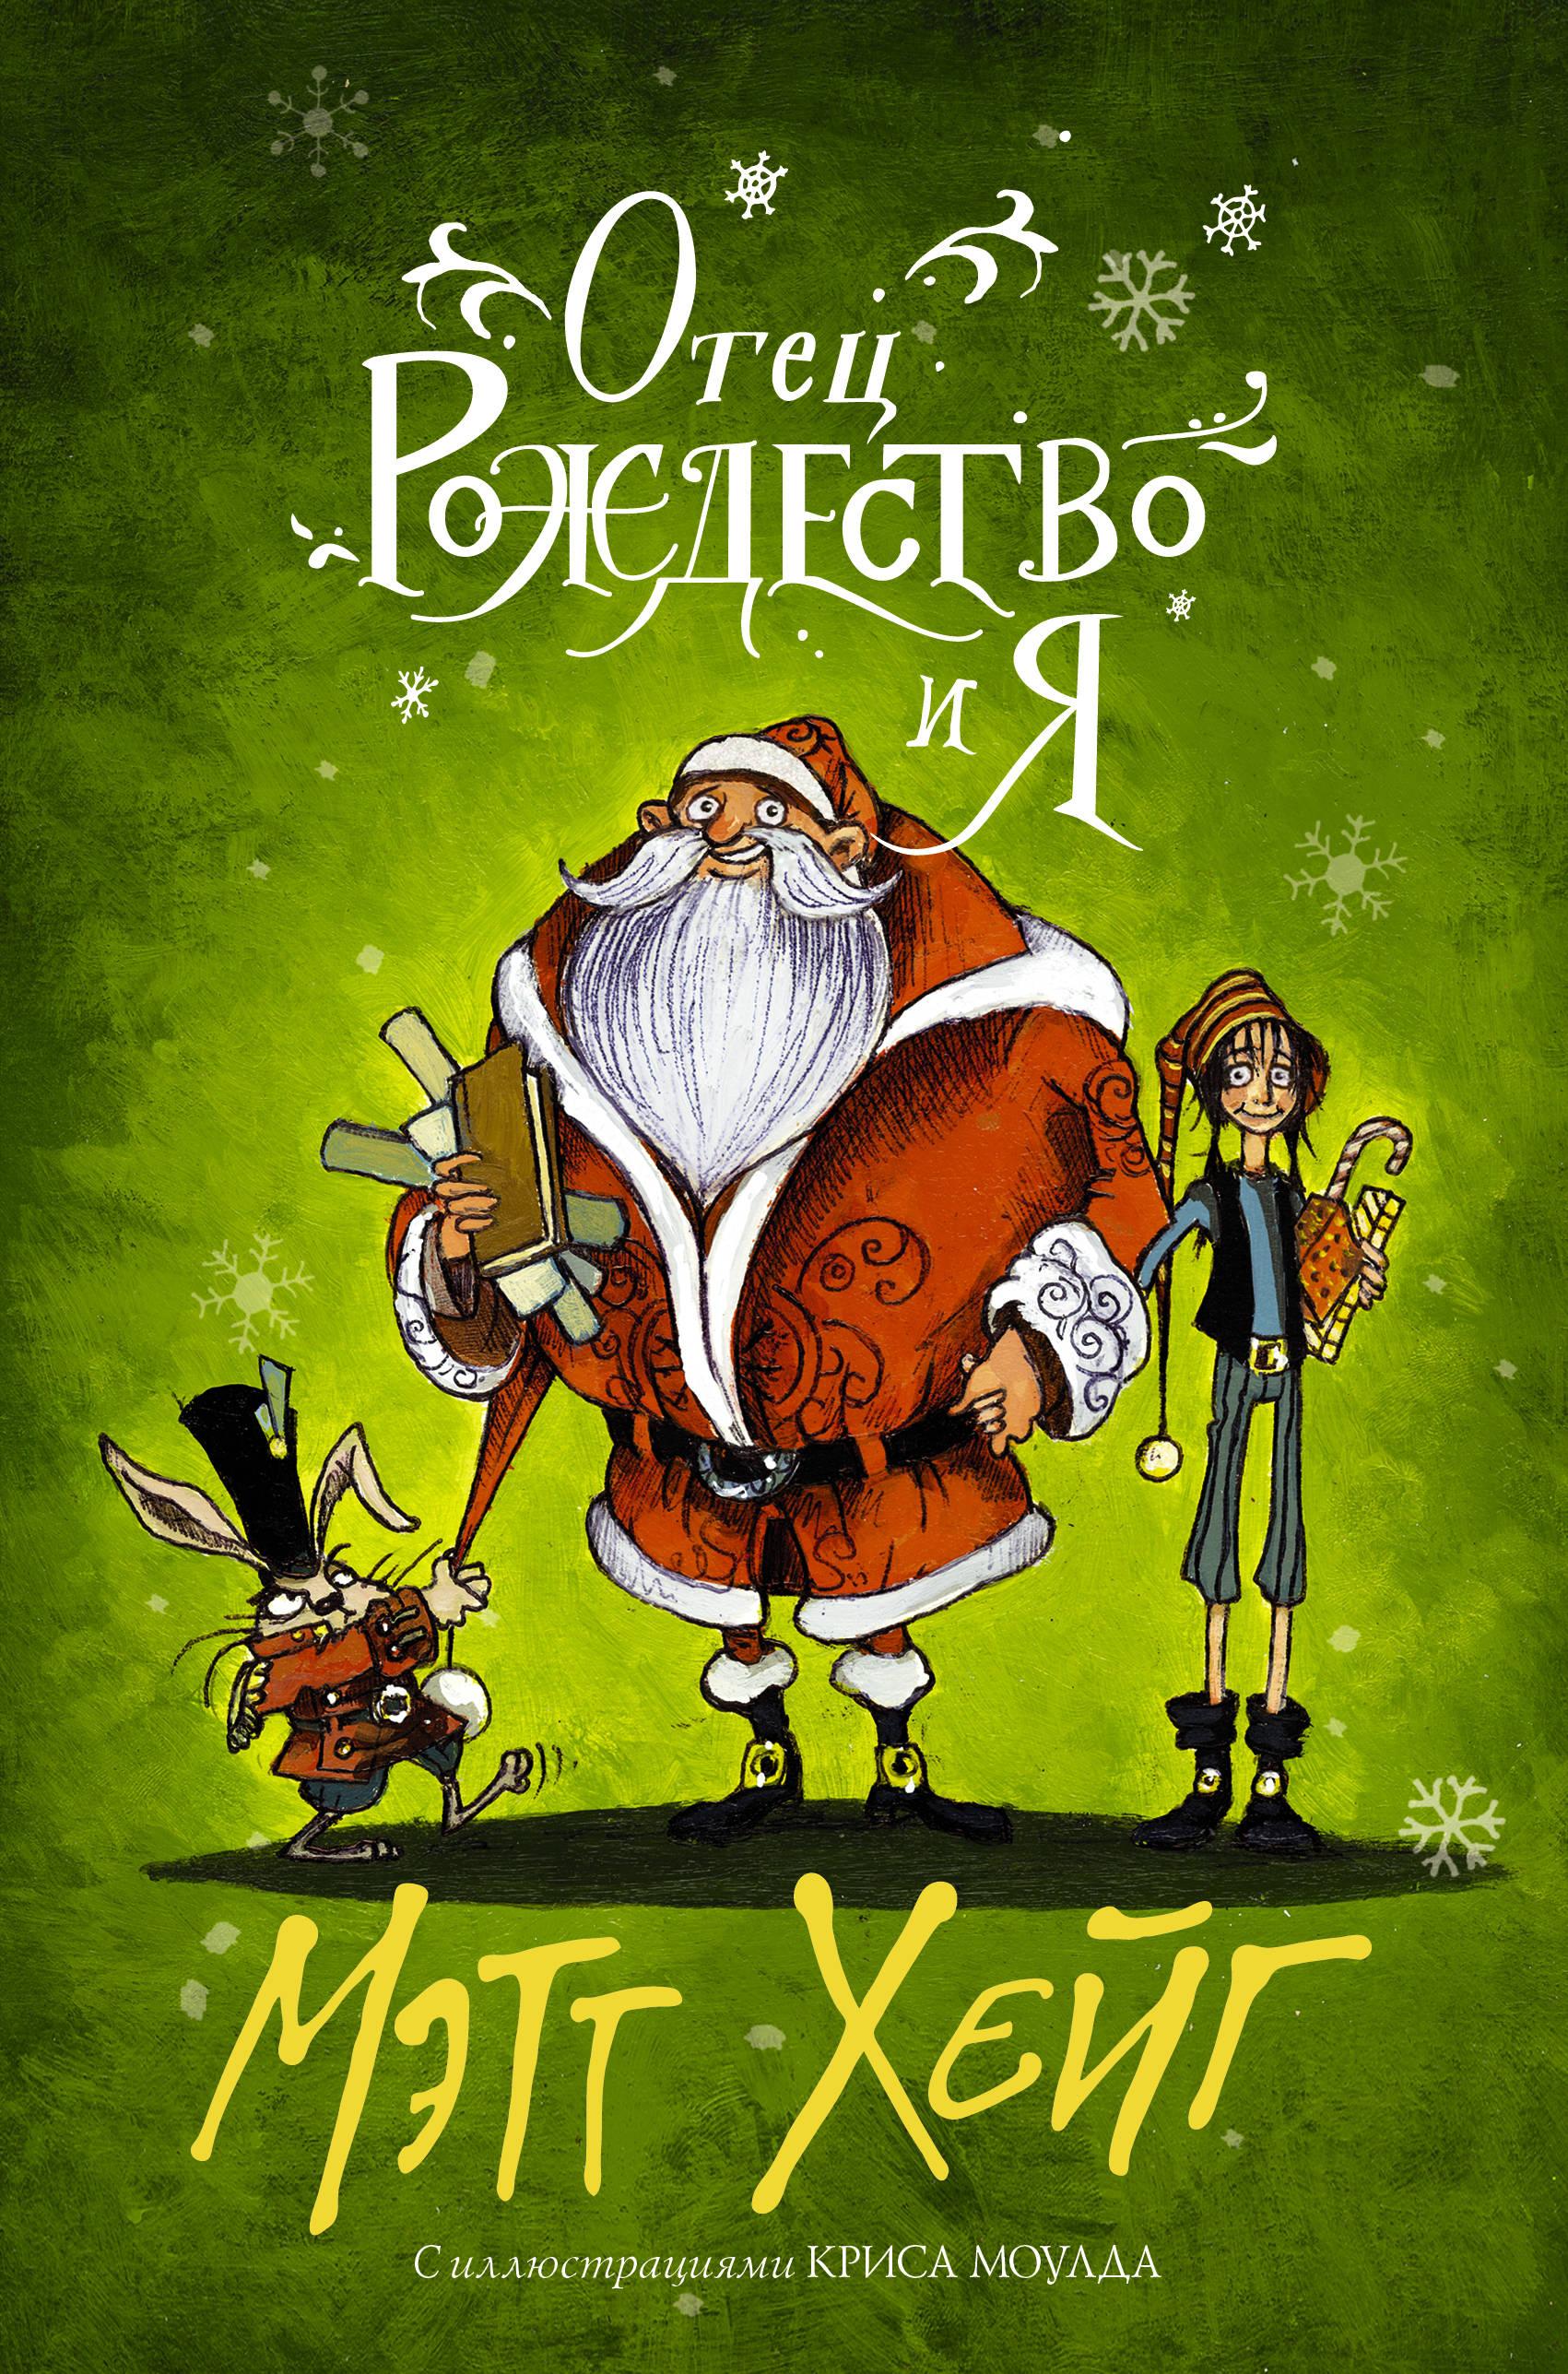 Мэтт Хейг Отец Рождество и Я хейг м отец рождество и я isbn 978 5 17 108251 2